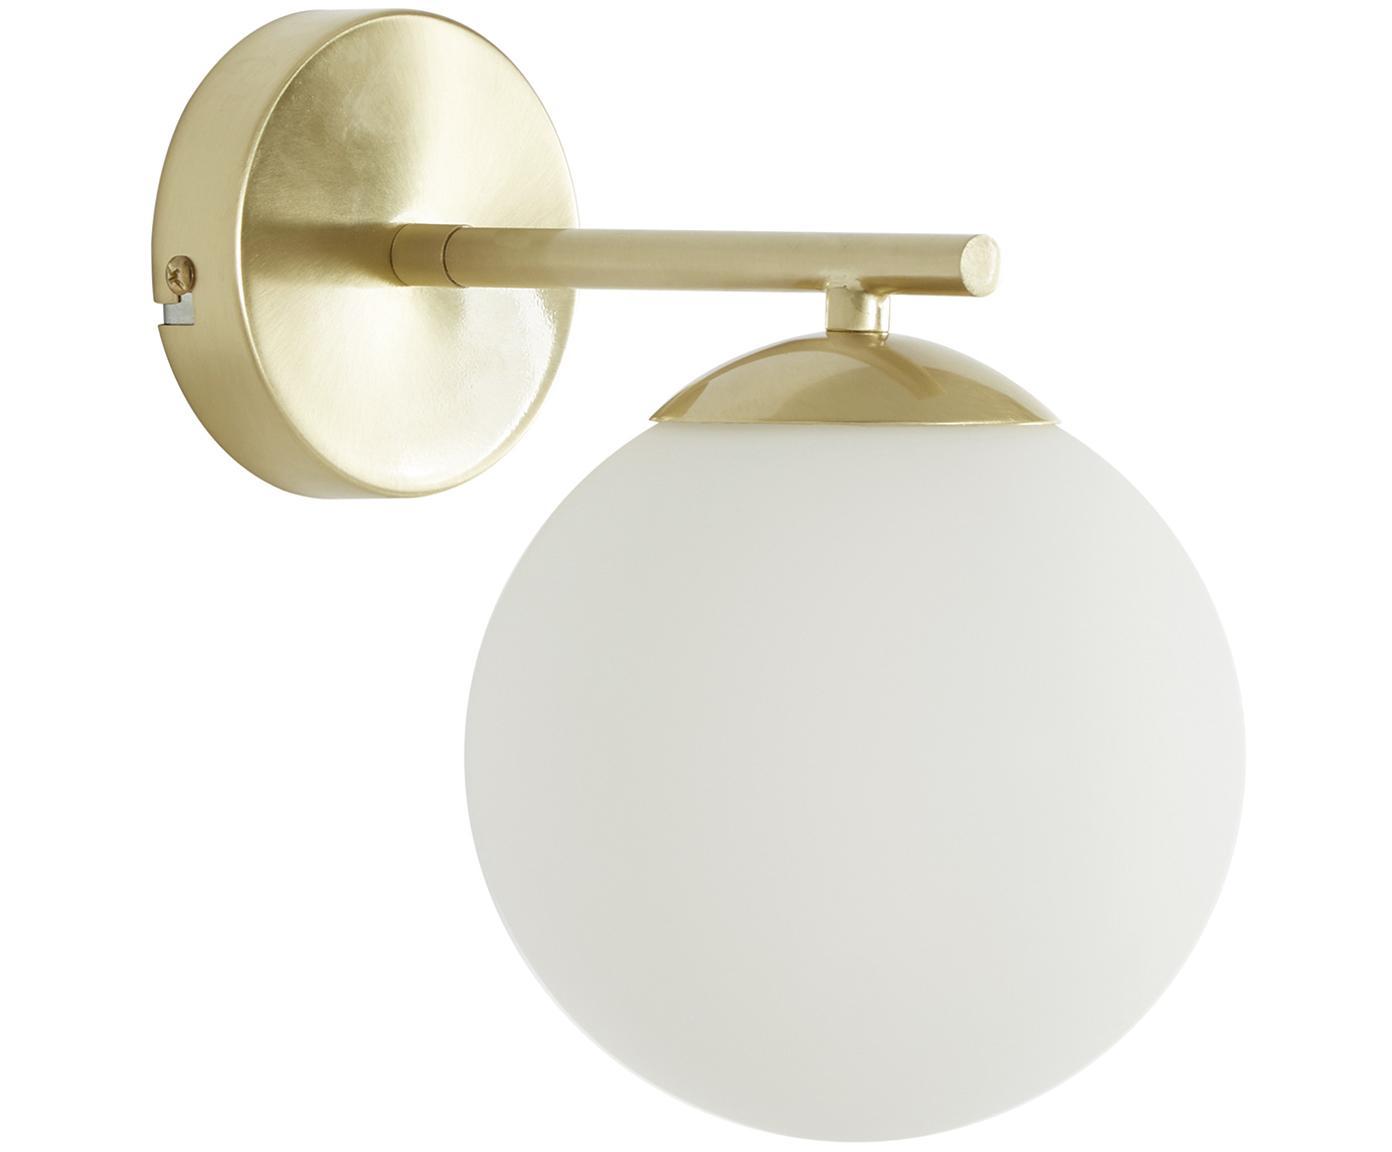 Wandlamp Liv, Lampenkap: glas, Wit, messingkleurig, 15 x 22 cm